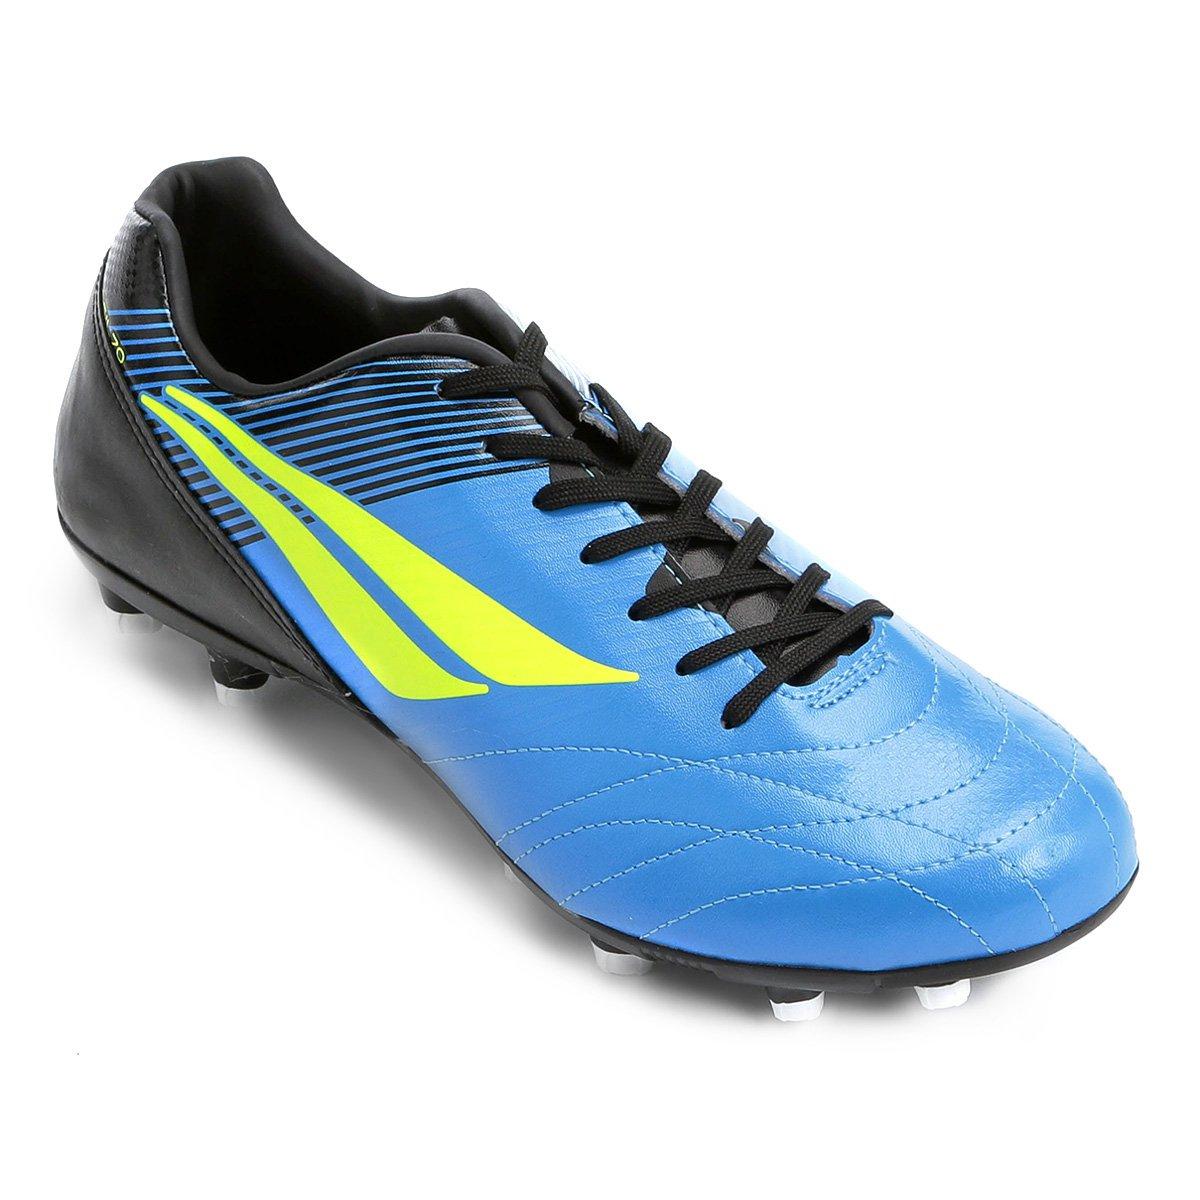 Chuteira Campo Penalty Brasil 70 R2 VIII - Azul e Preto - Compre ... 89b06bebb5230